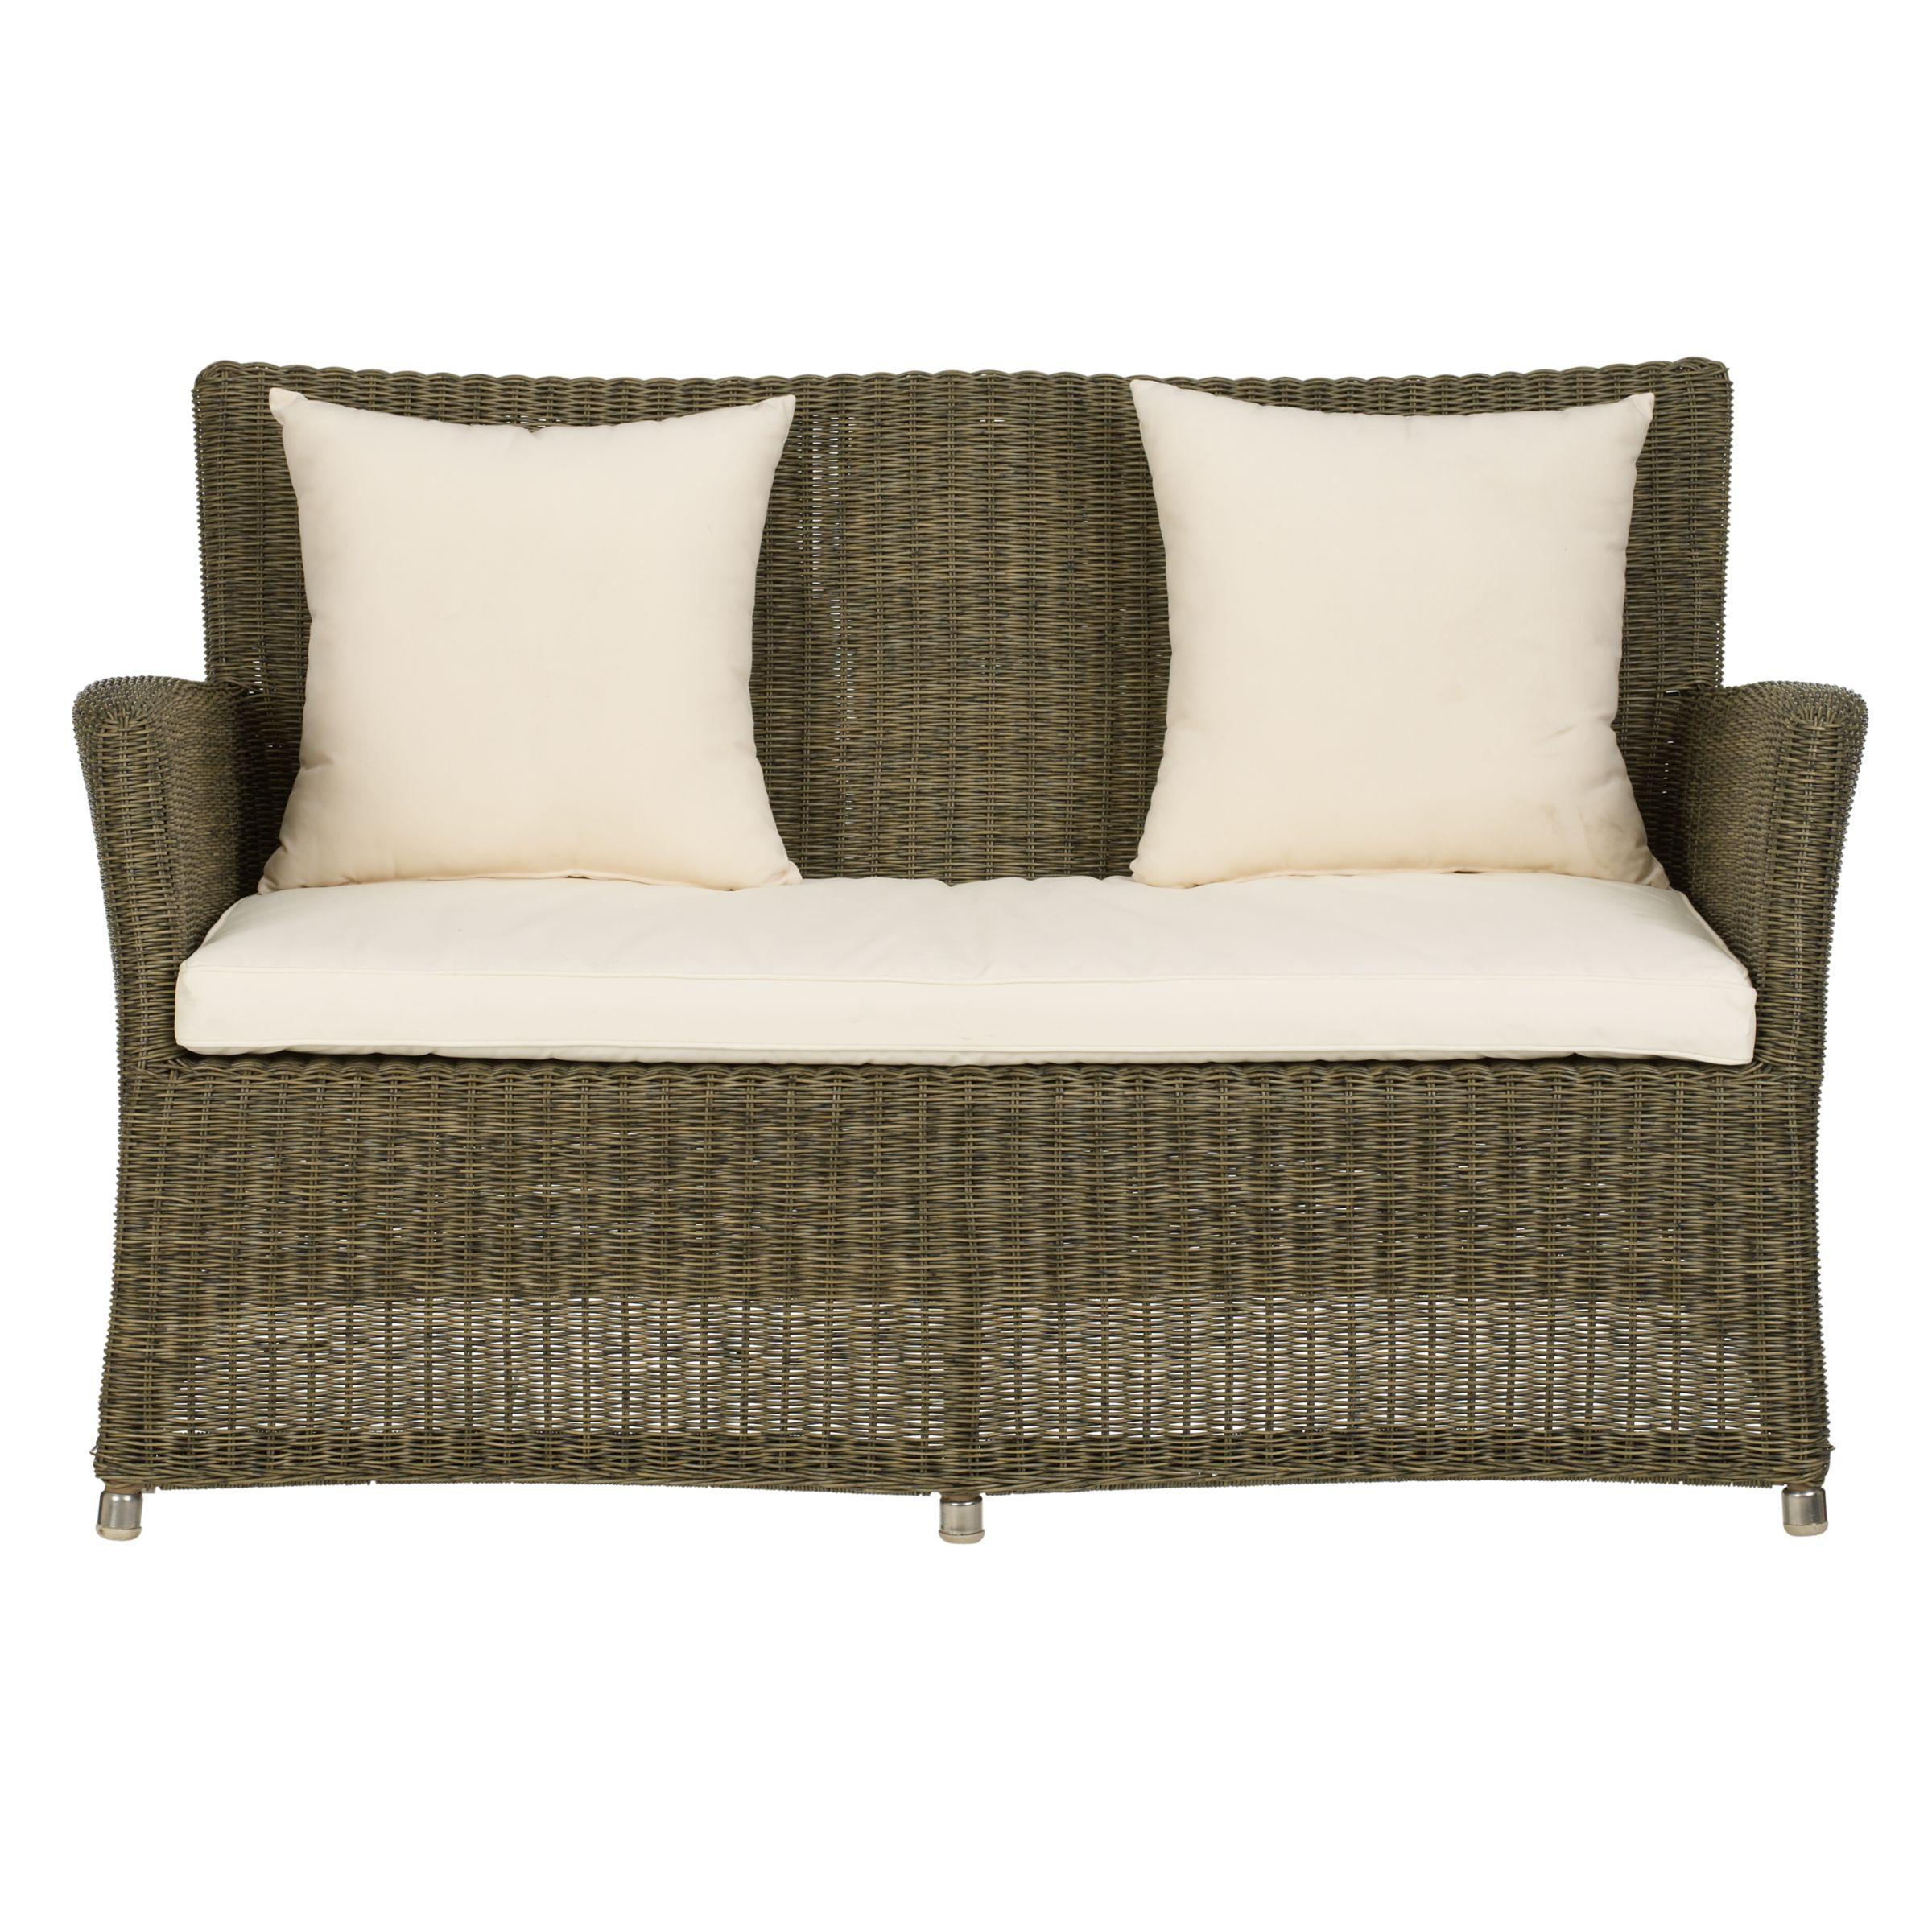 John Lewis Rimini Outdoor Sofa